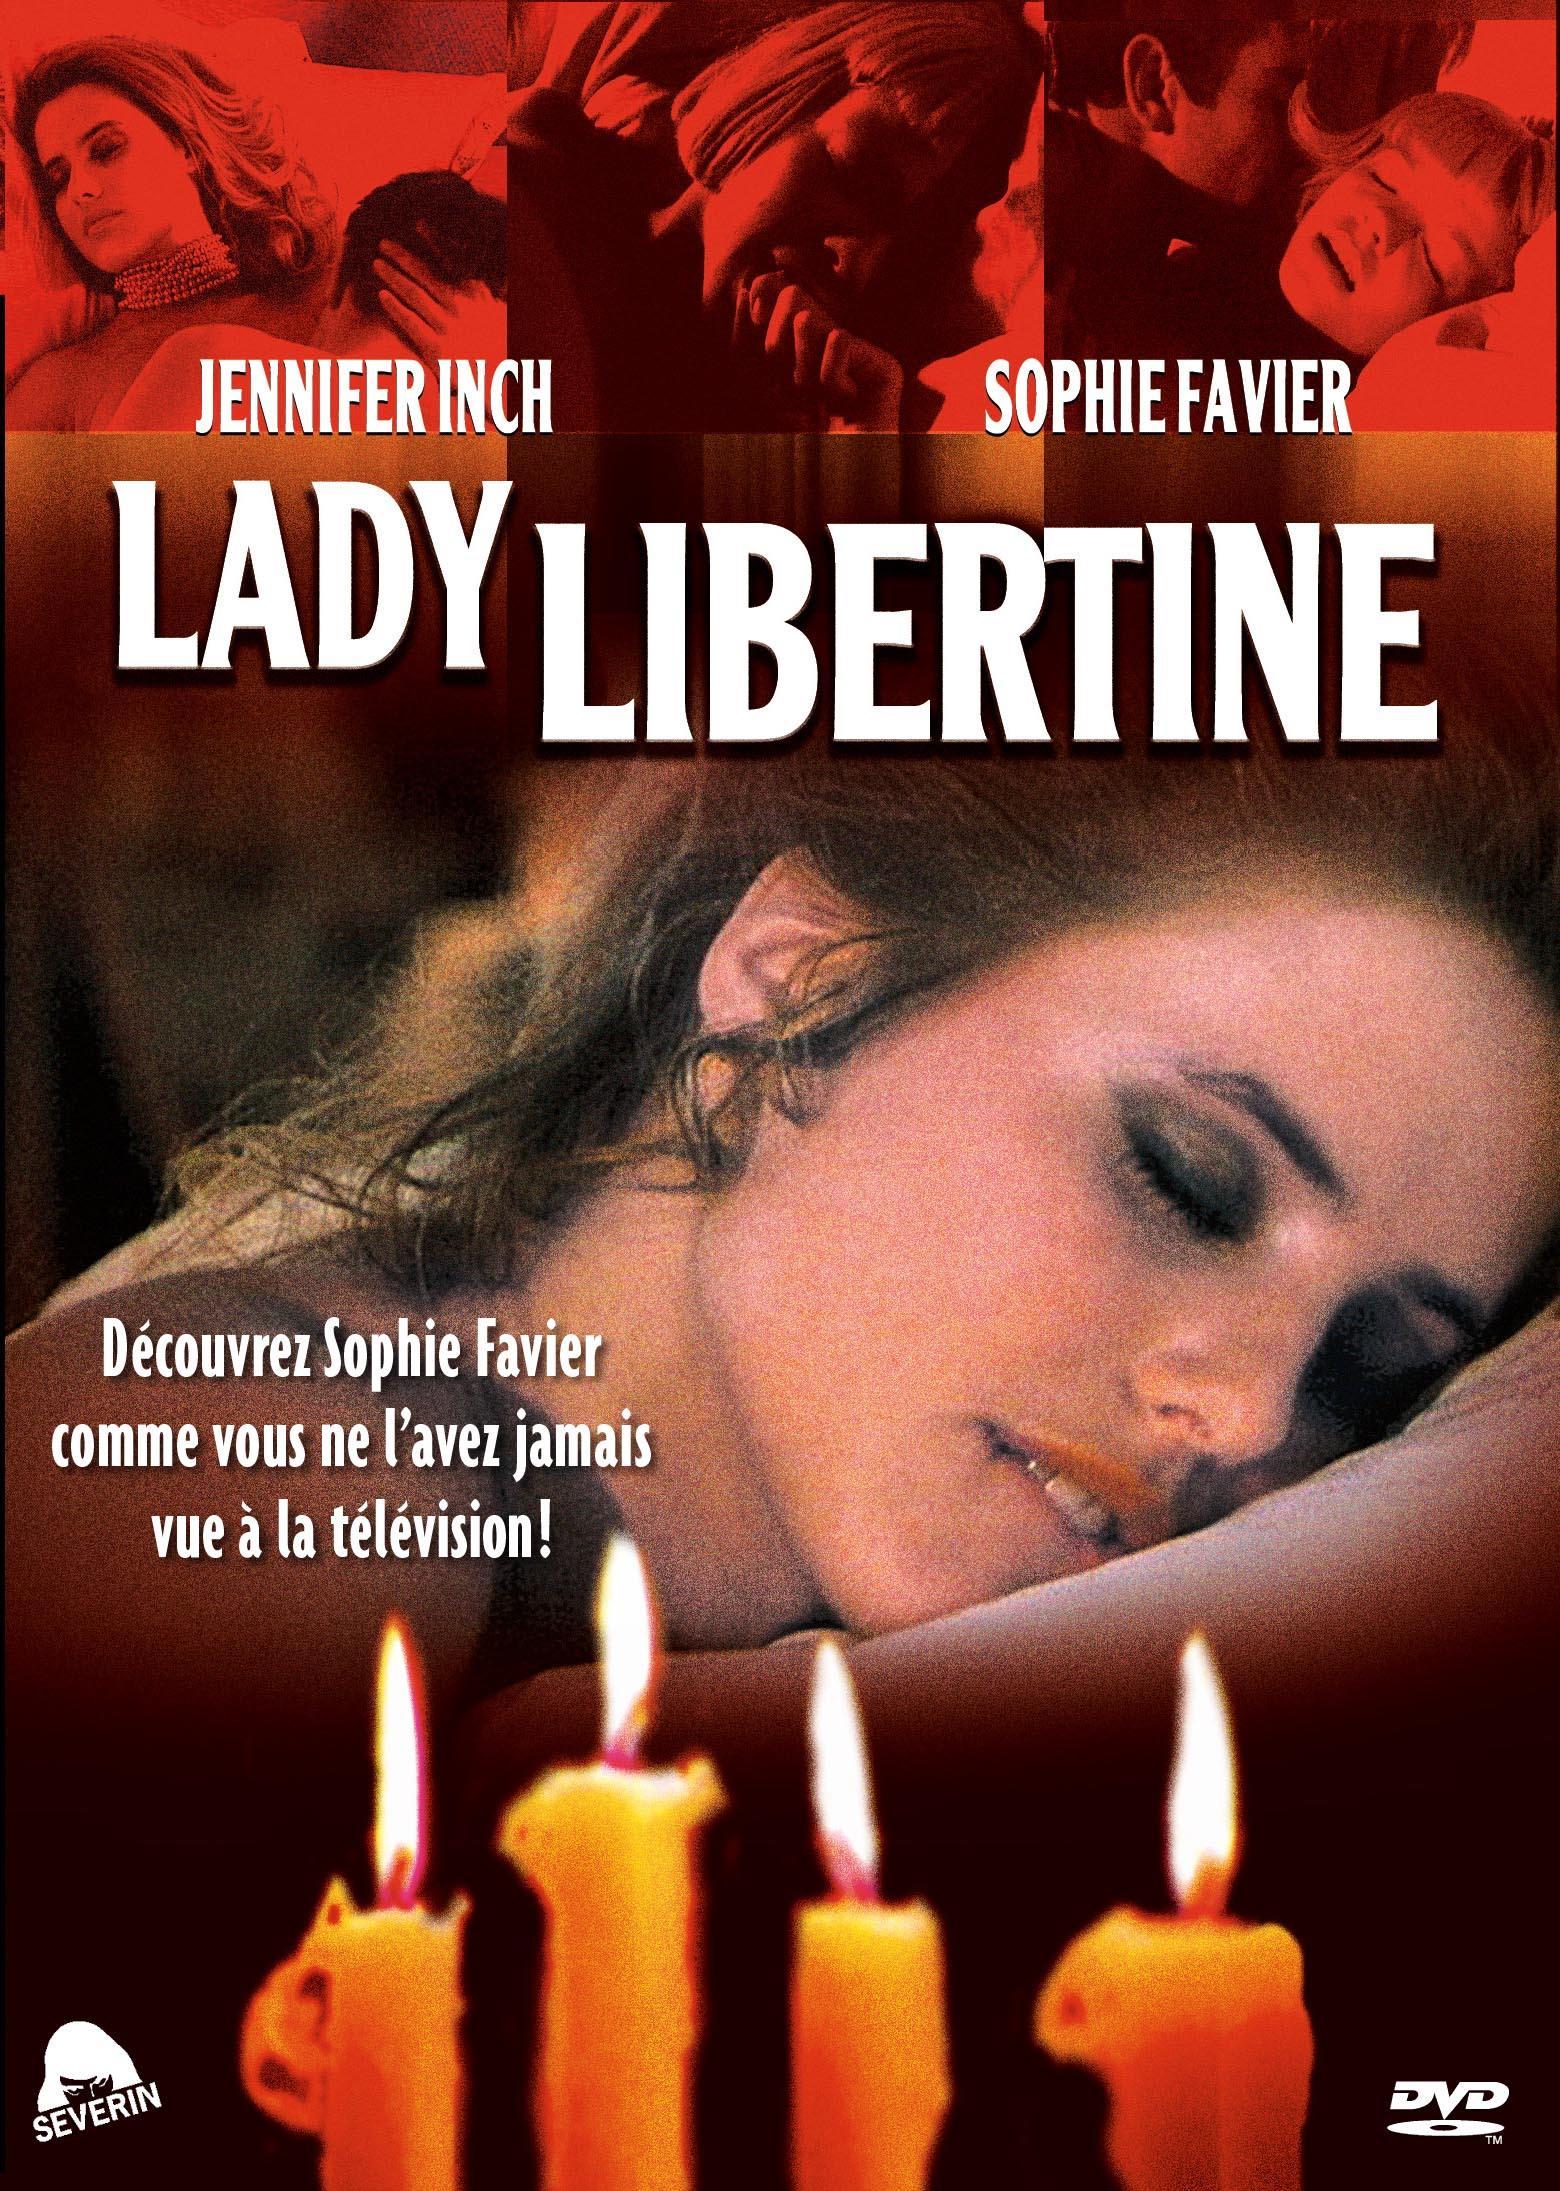 Lady libertine - dvd